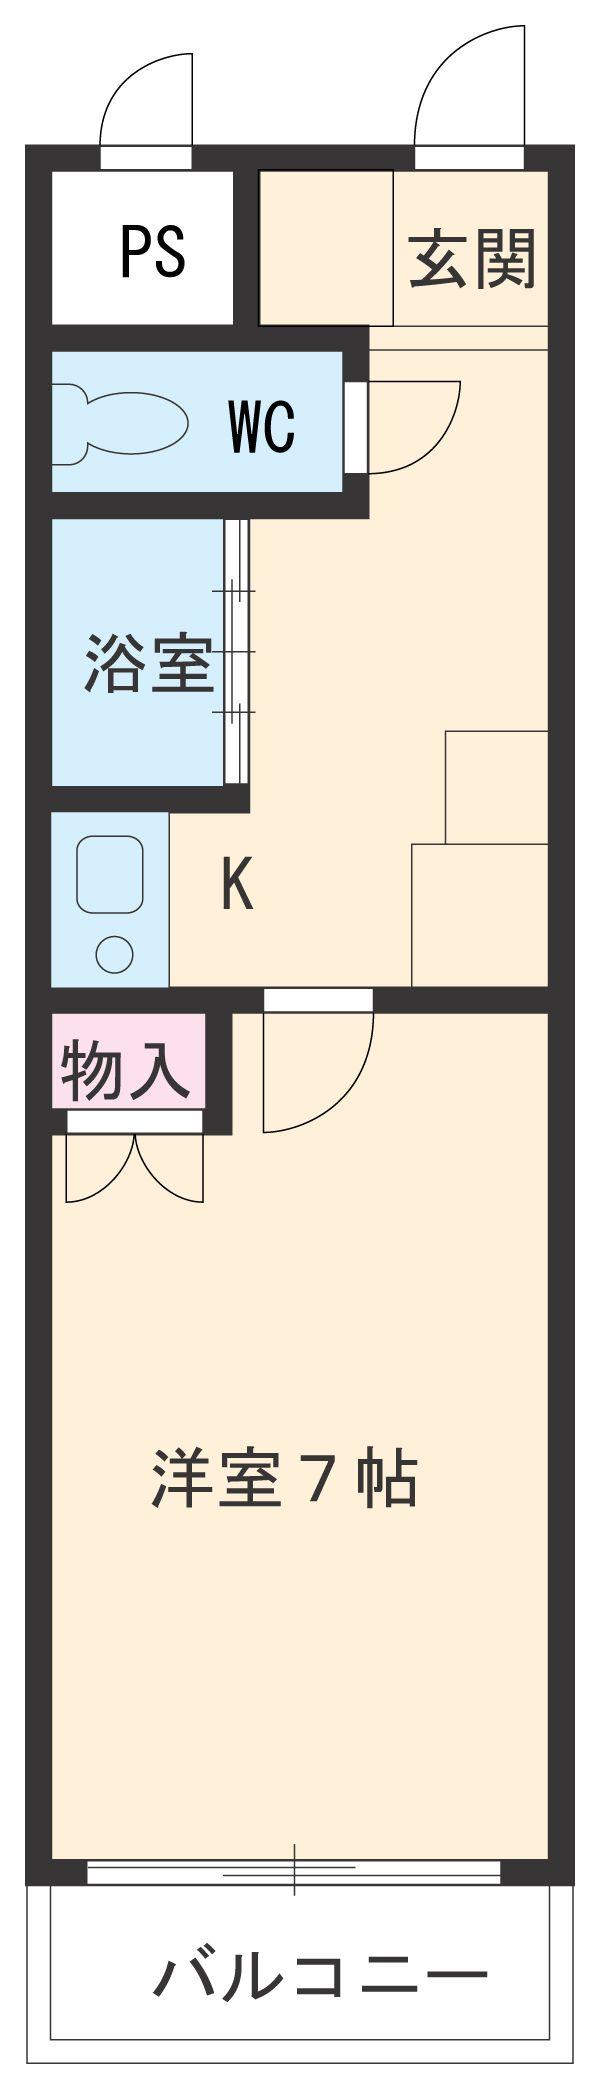 C'pac三河豊田 306号室の間取り